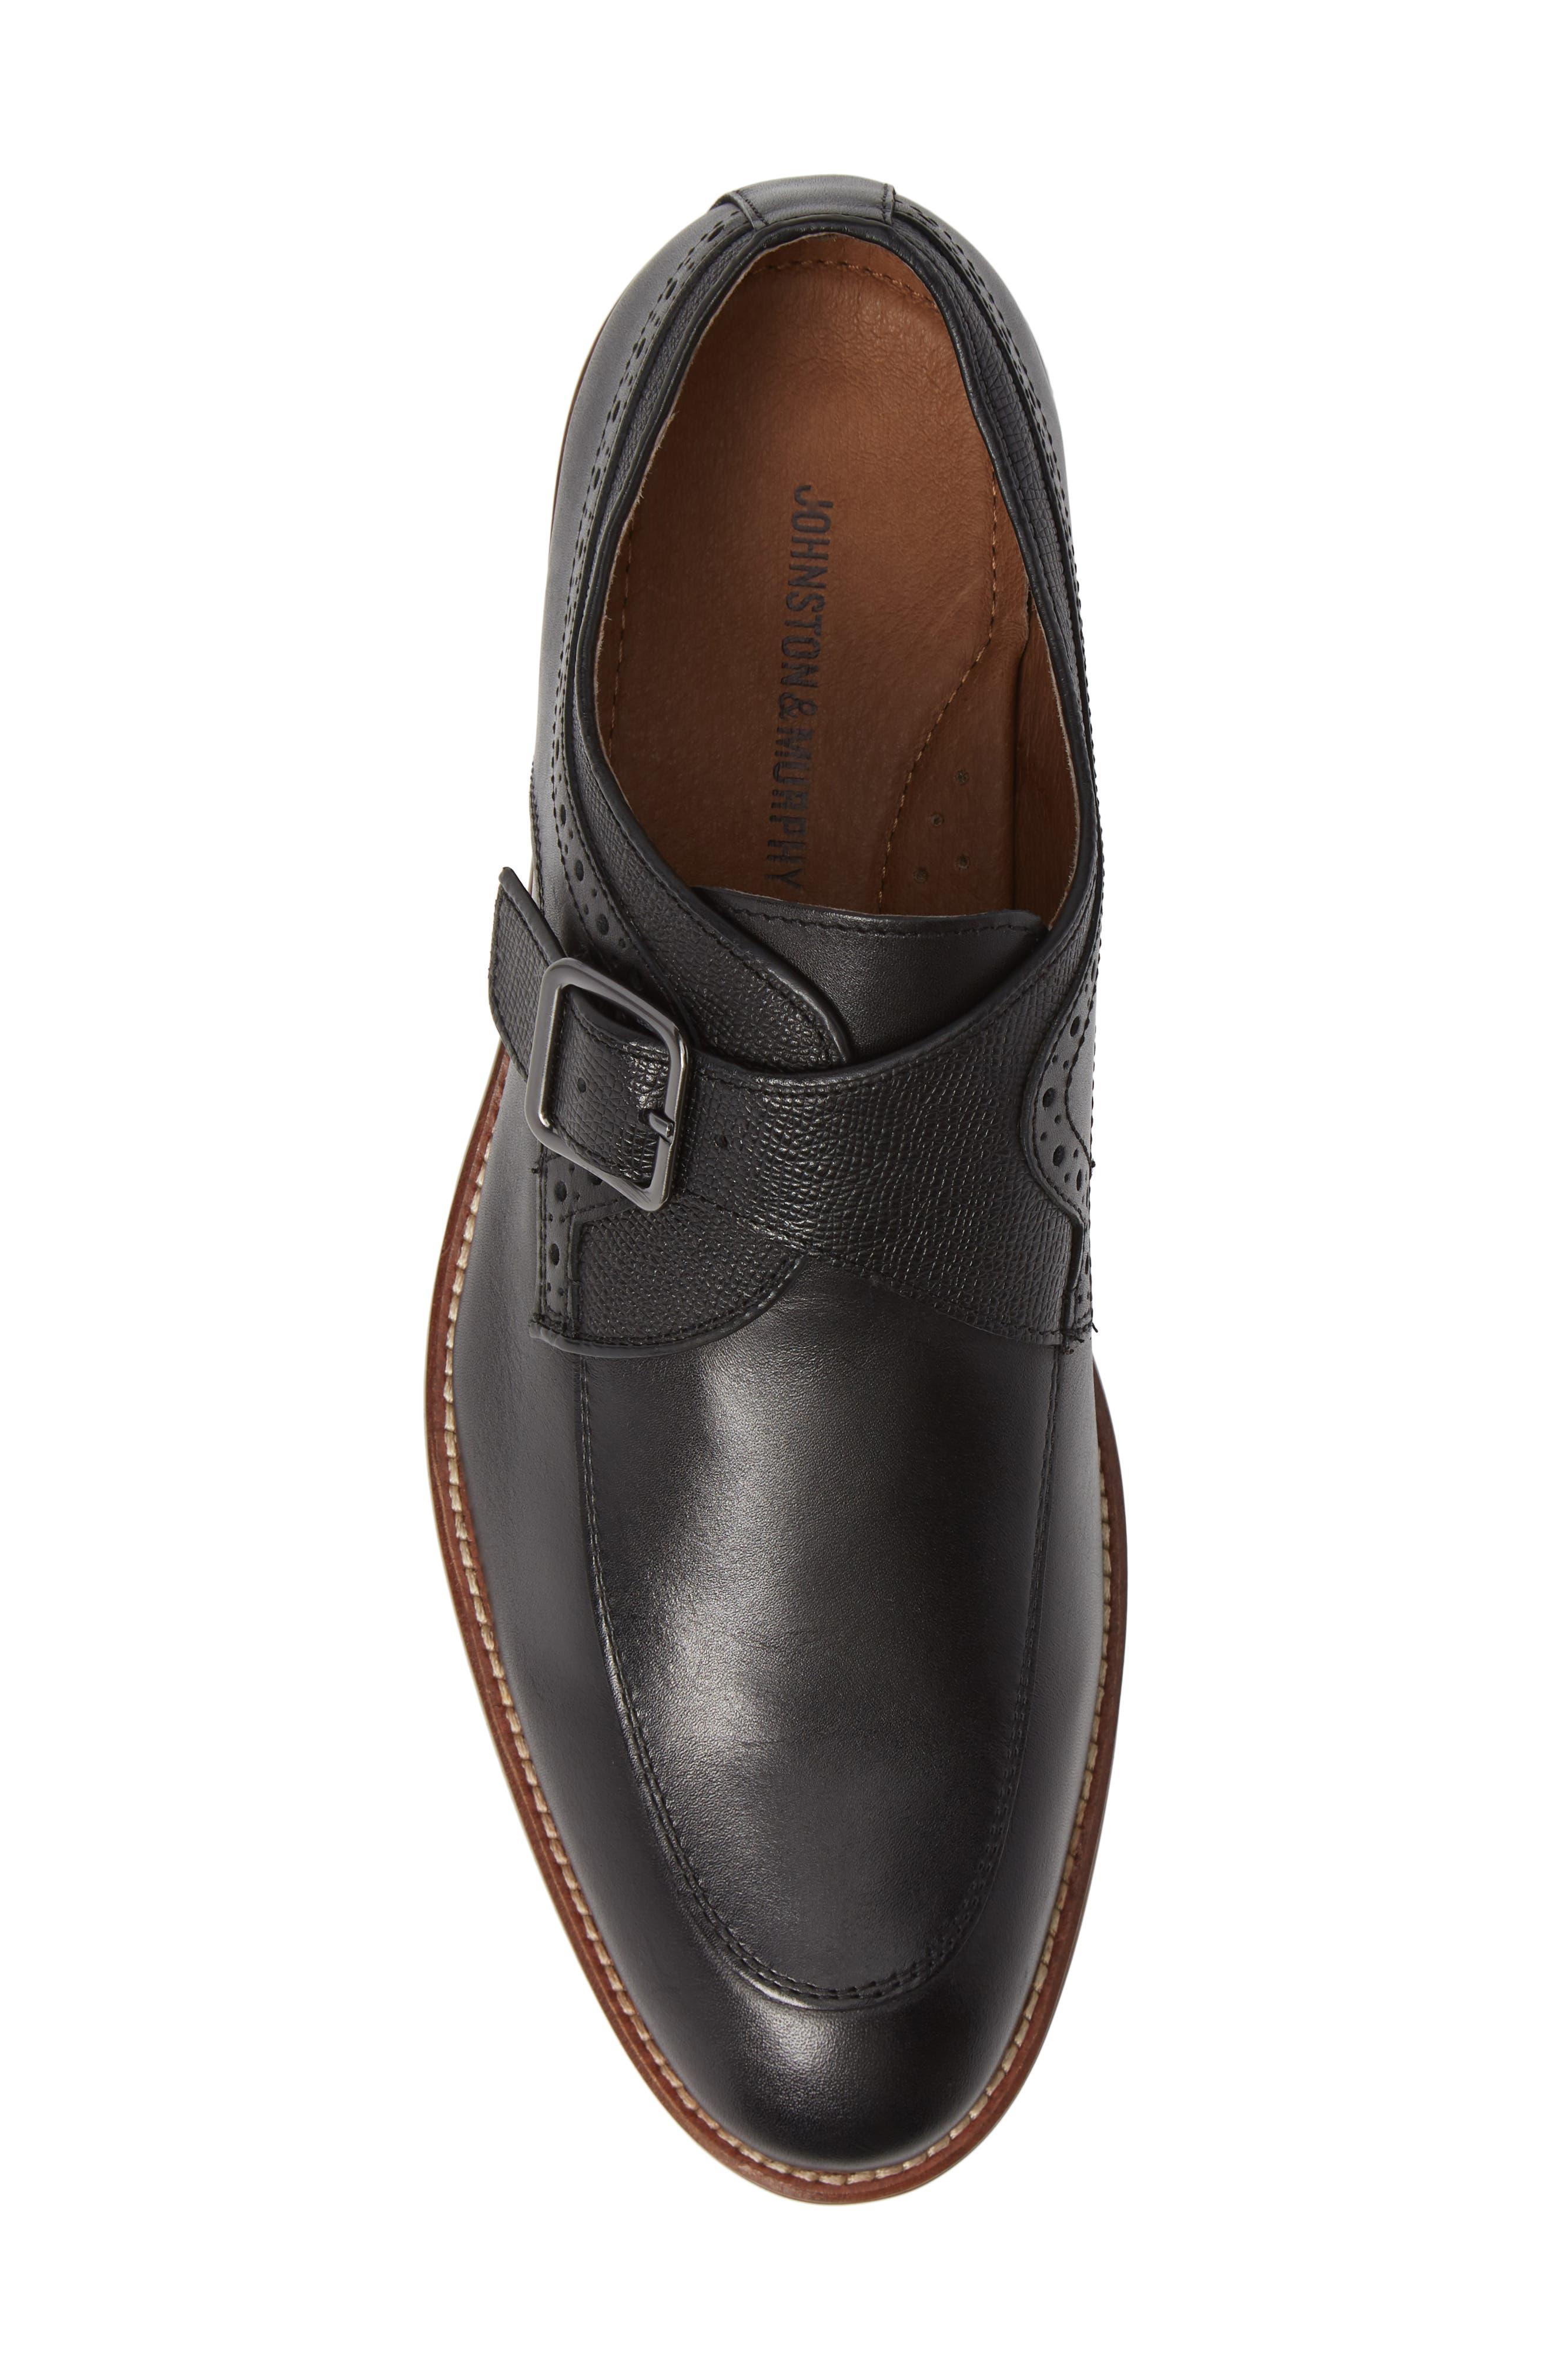 JOHNSTON & MURPHY, Conard Monk Strap Shoe, Alternate thumbnail 5, color, BLACK LEATHER